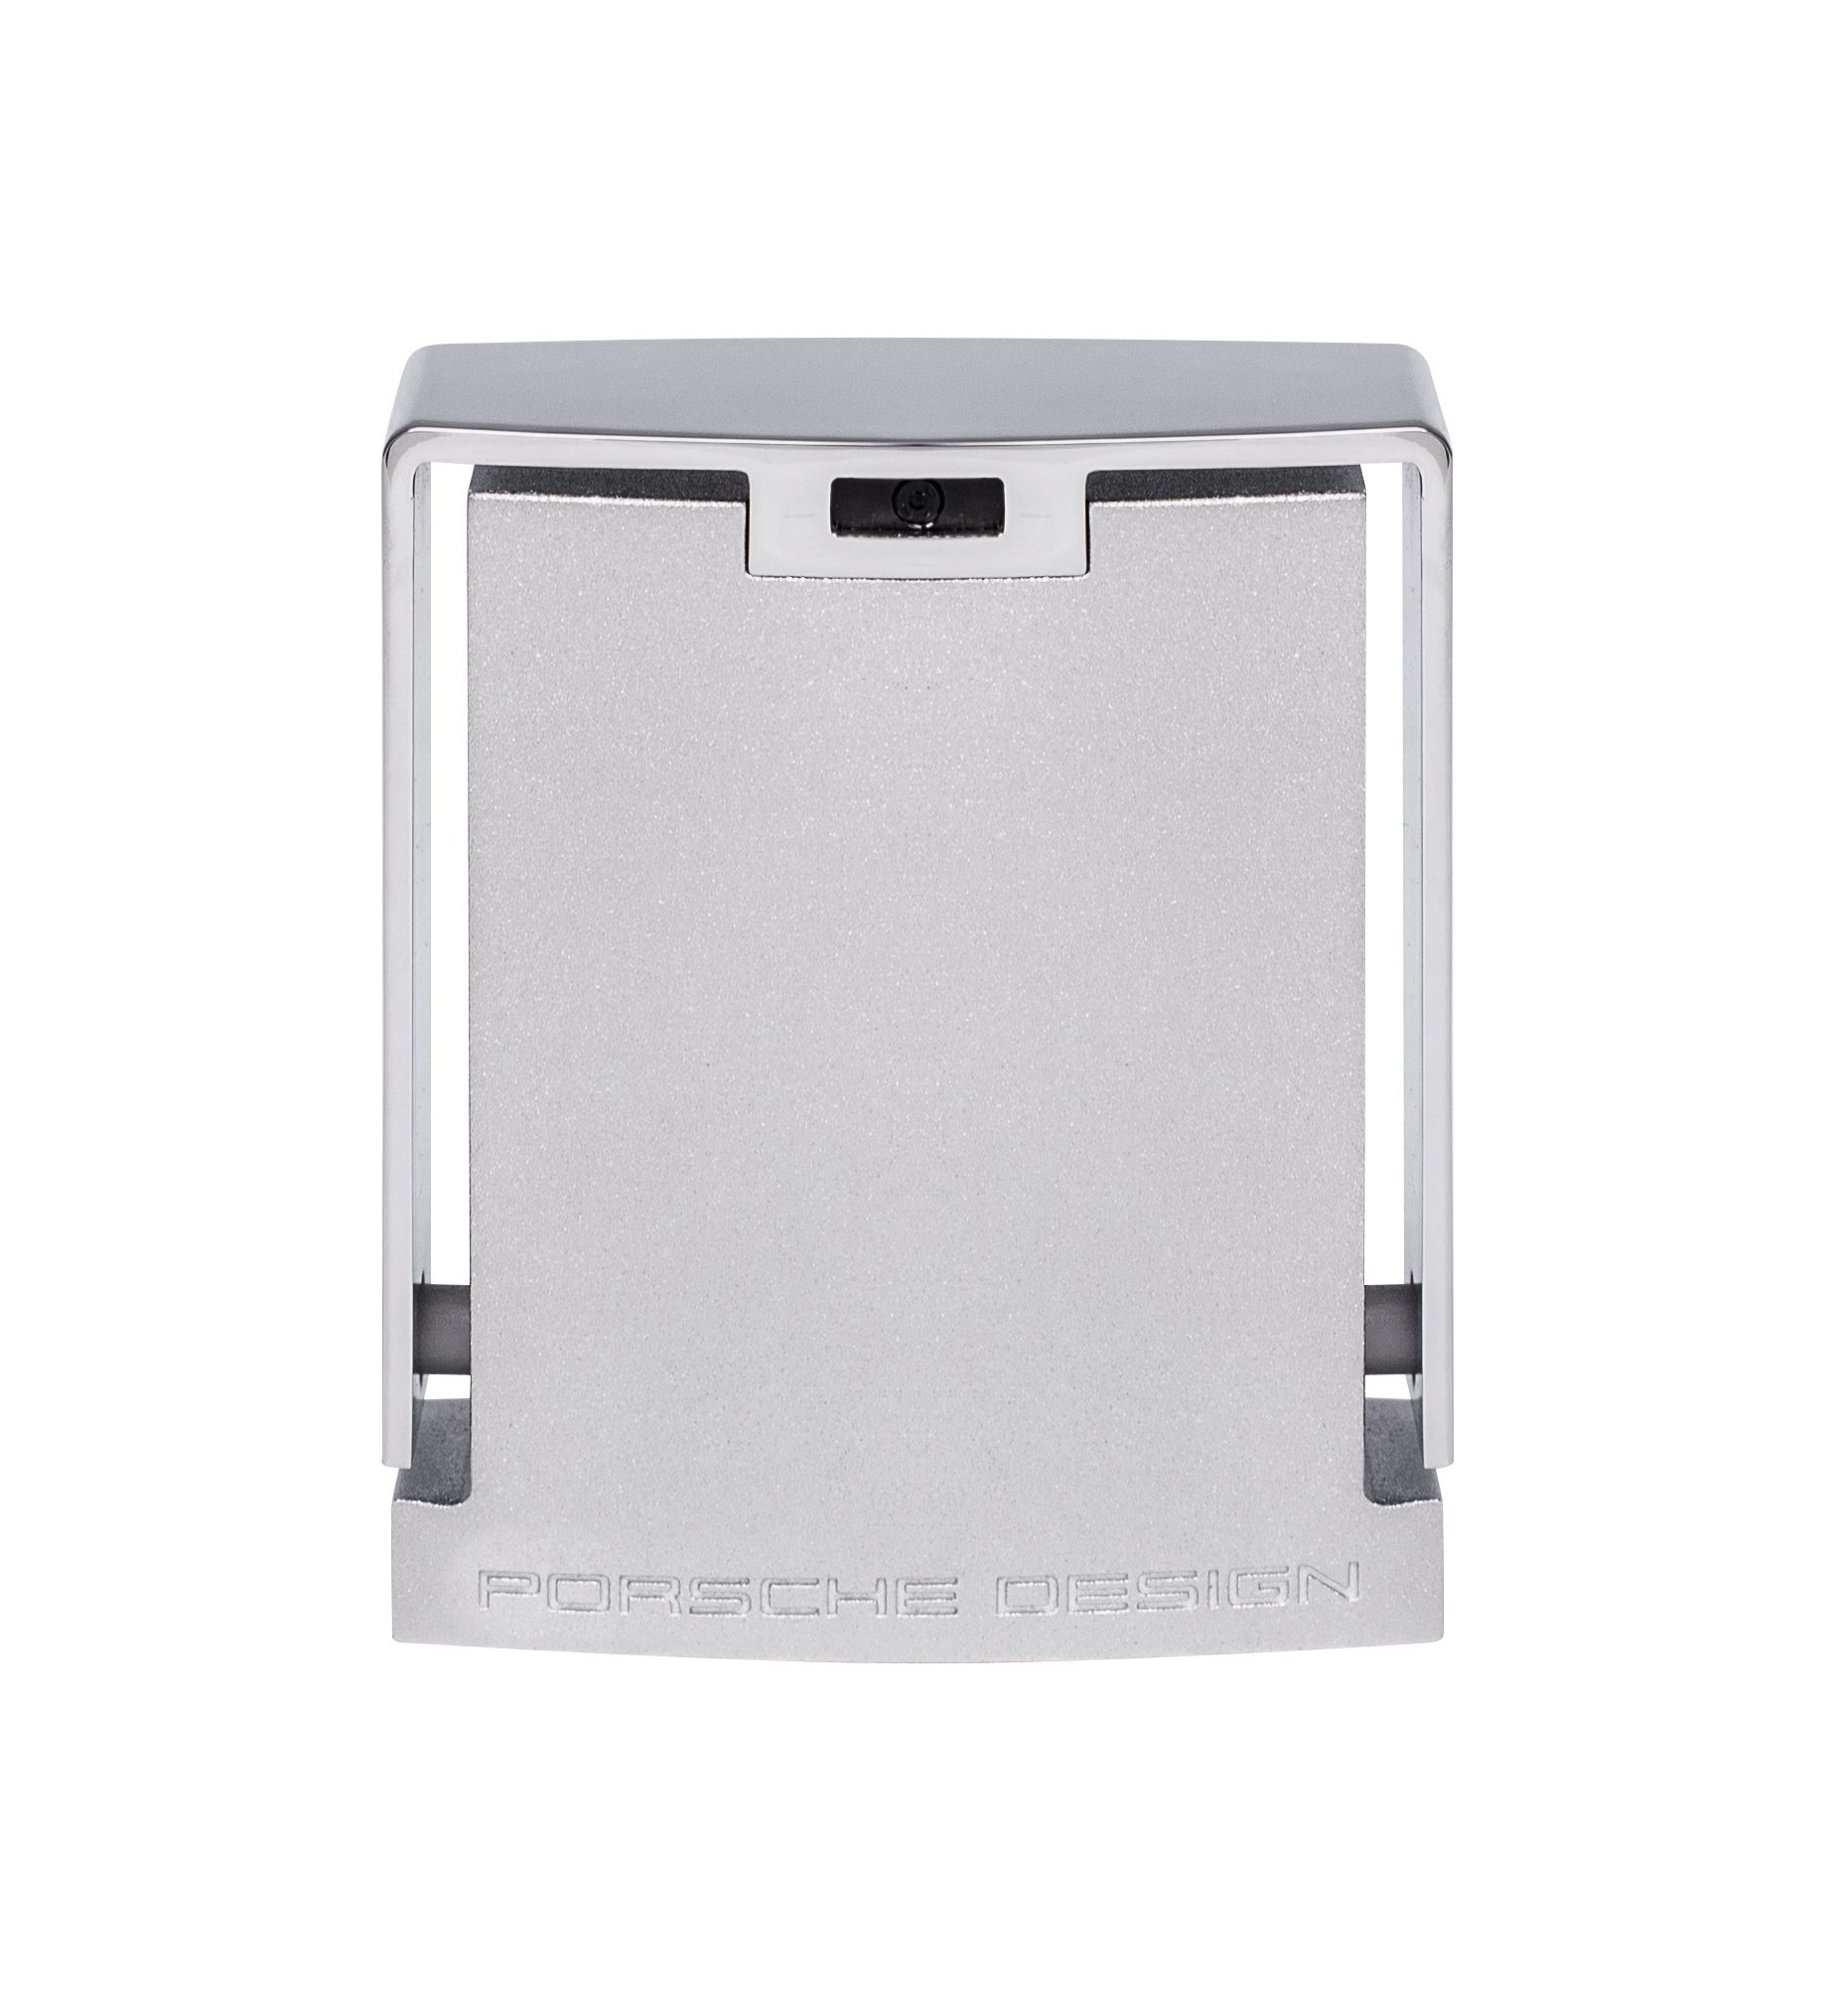 Porsche Design Titan Eau de Toilette 30ml